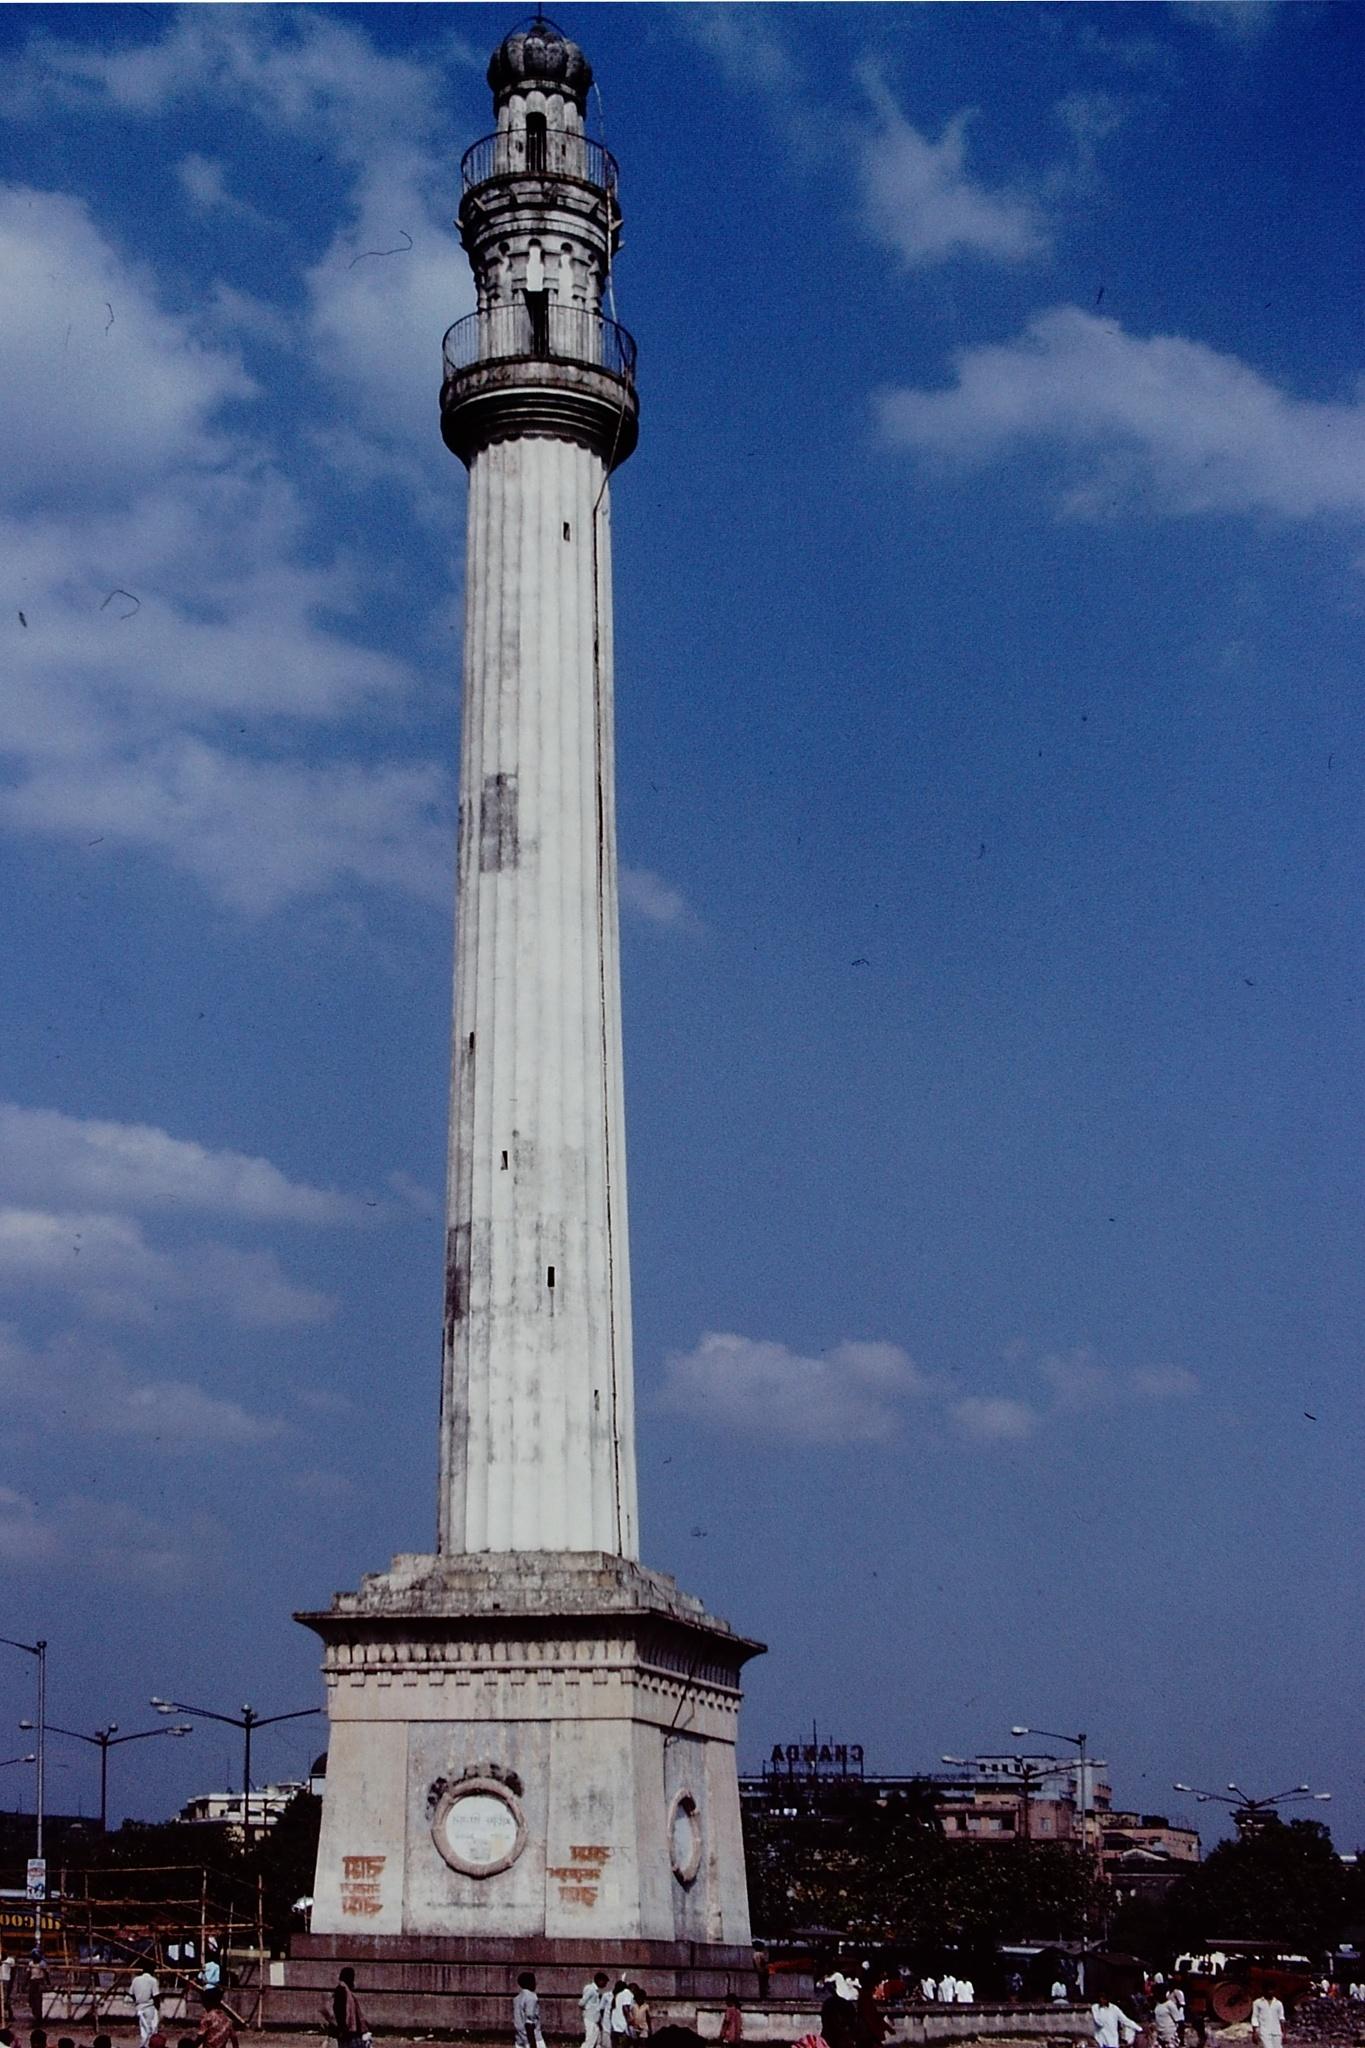 MONUMENT, CALCUTTA, INDIA by Akin Saner